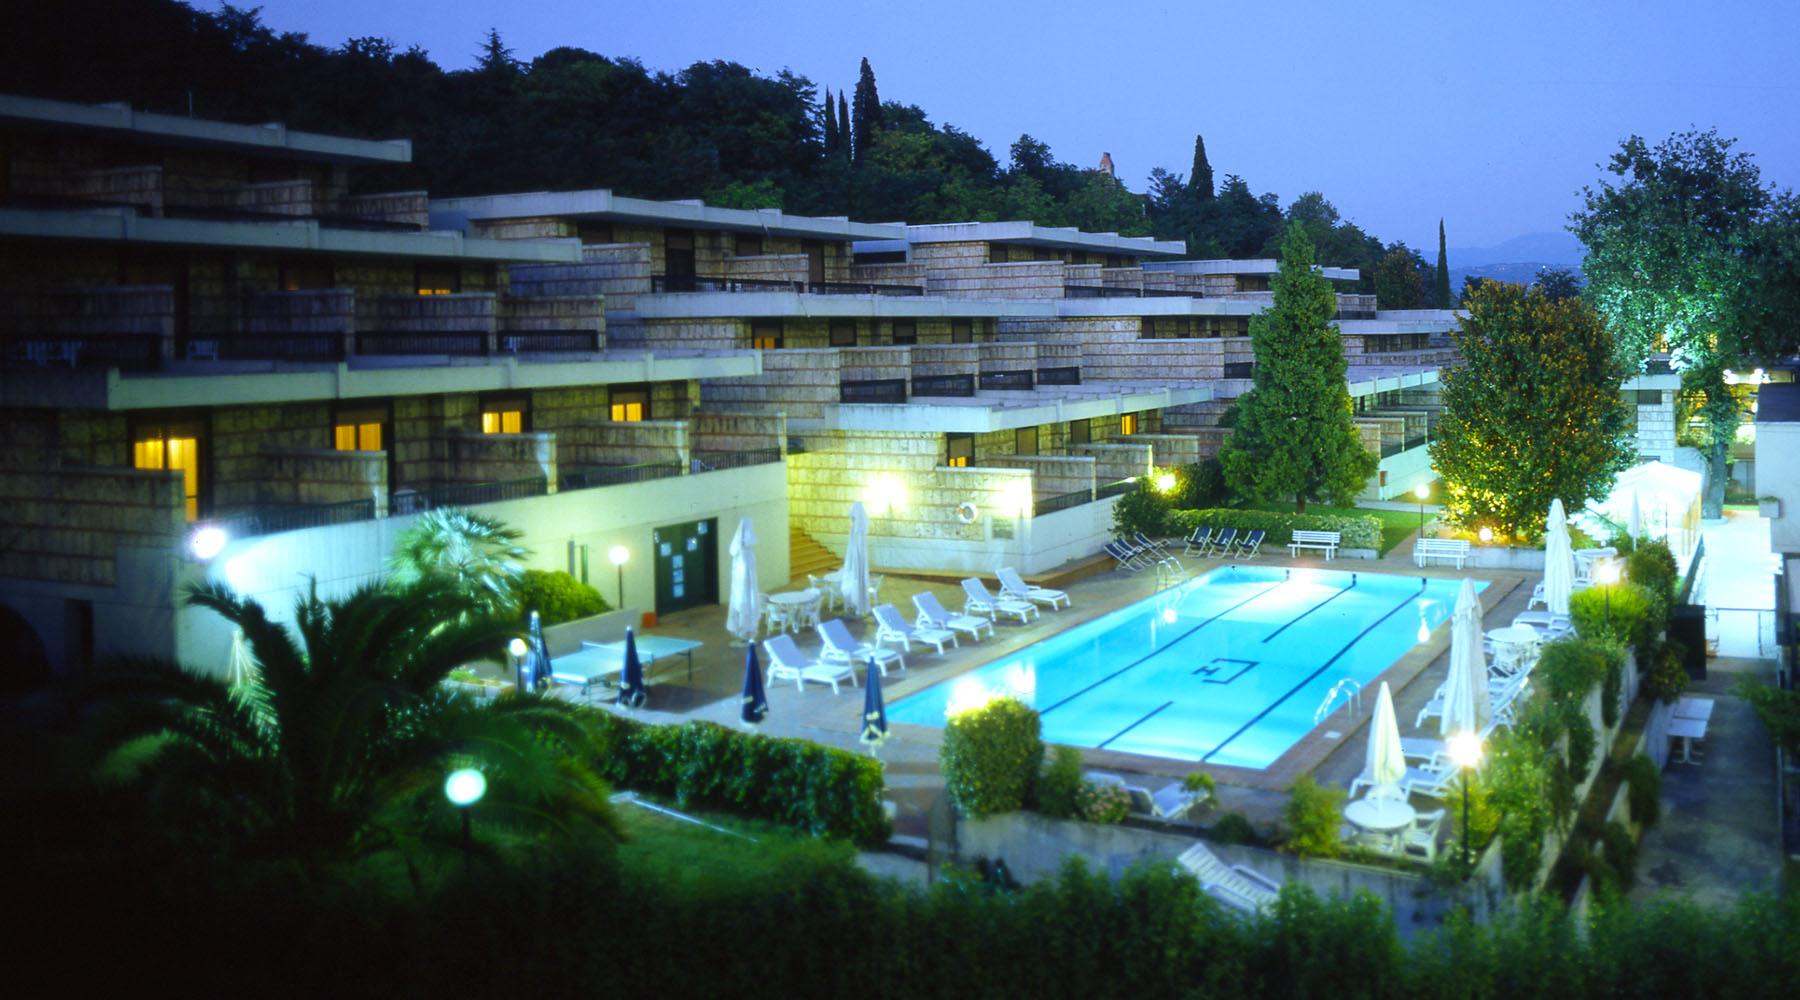 Rodon Garden Hotel - room photo 8683807